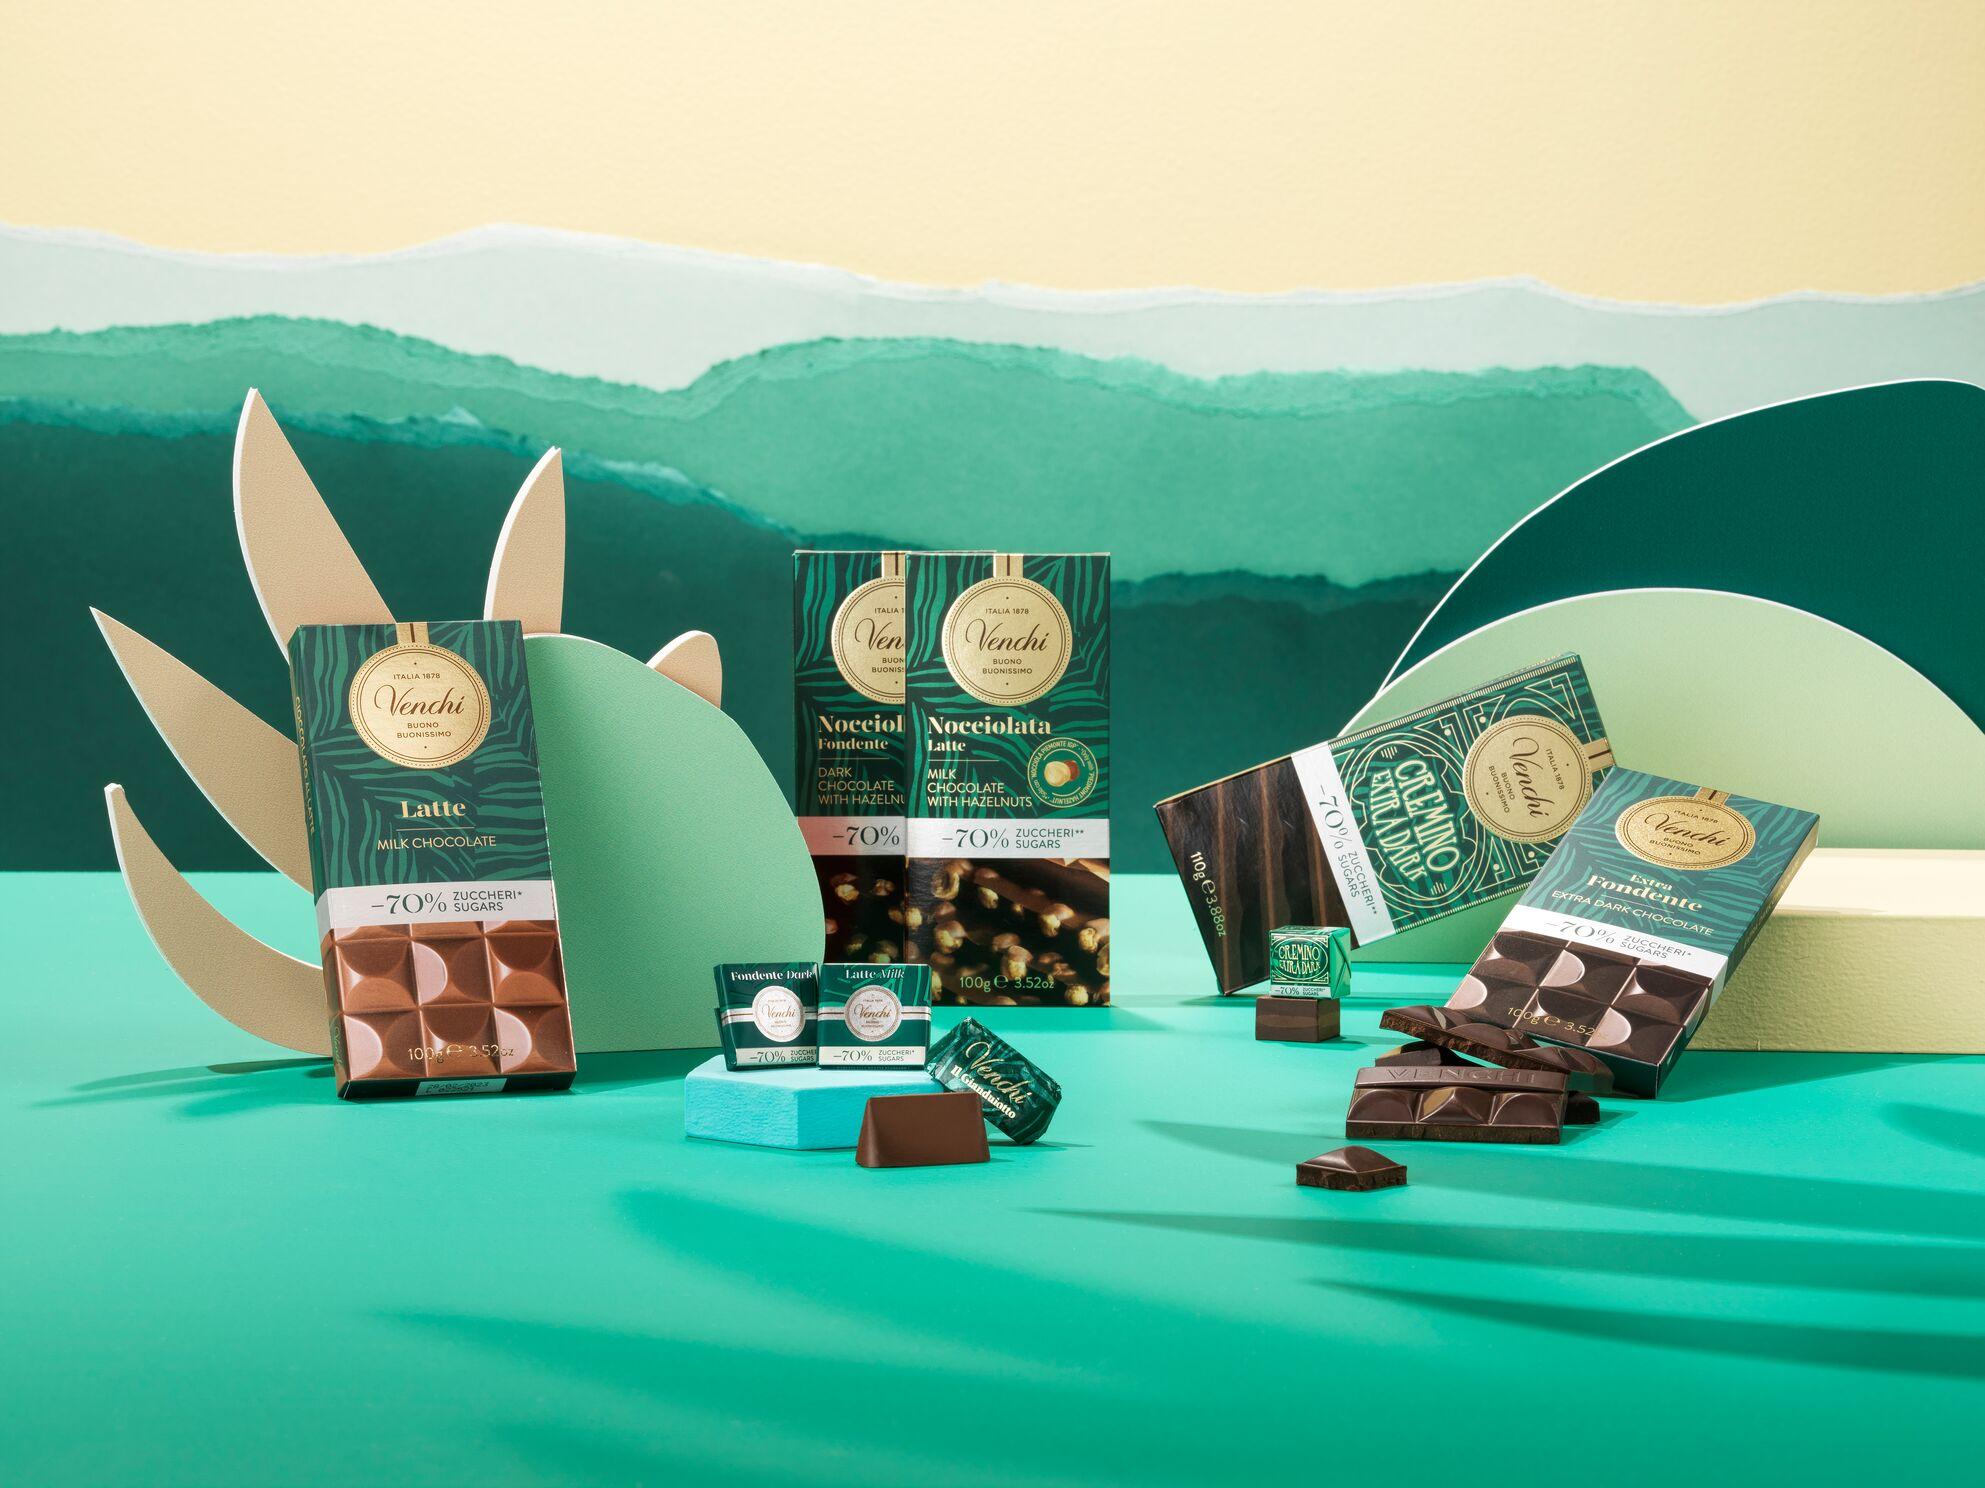 venchi italian chocolate 70% less sugar gluten free